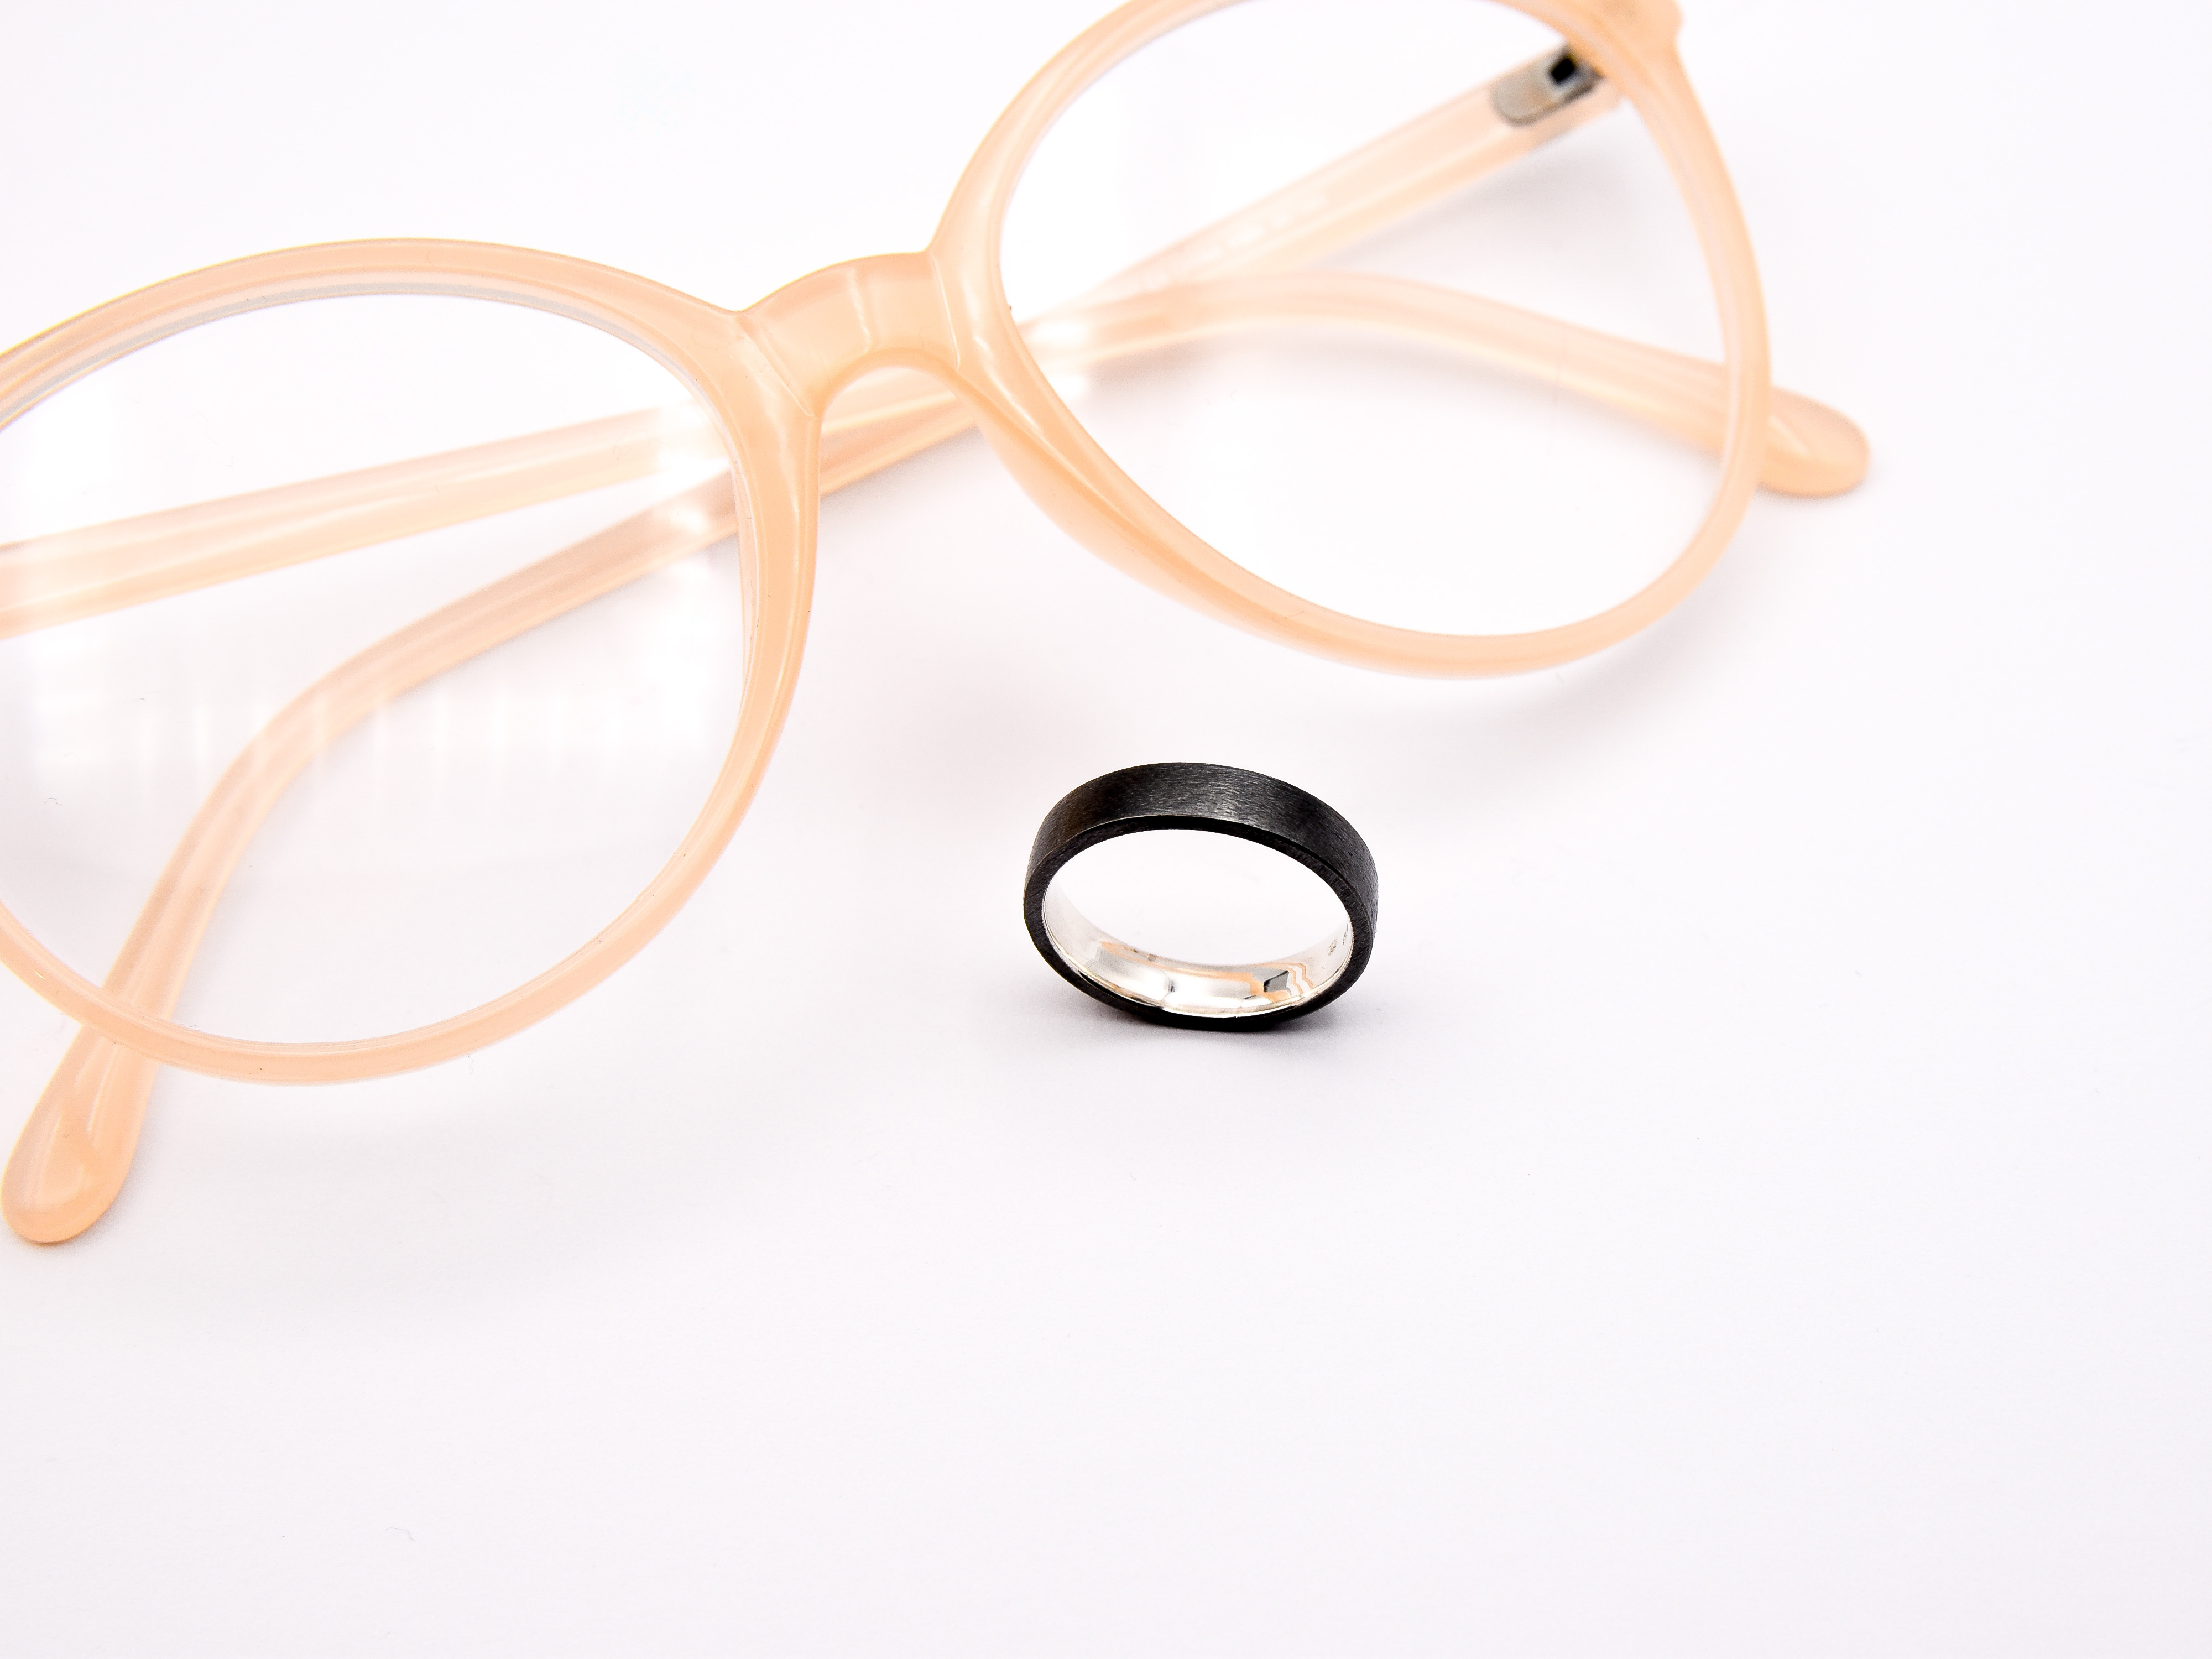 Pure-Ring-Unisex-Silberring-hangefertigter-Schmuck-Goldcircus